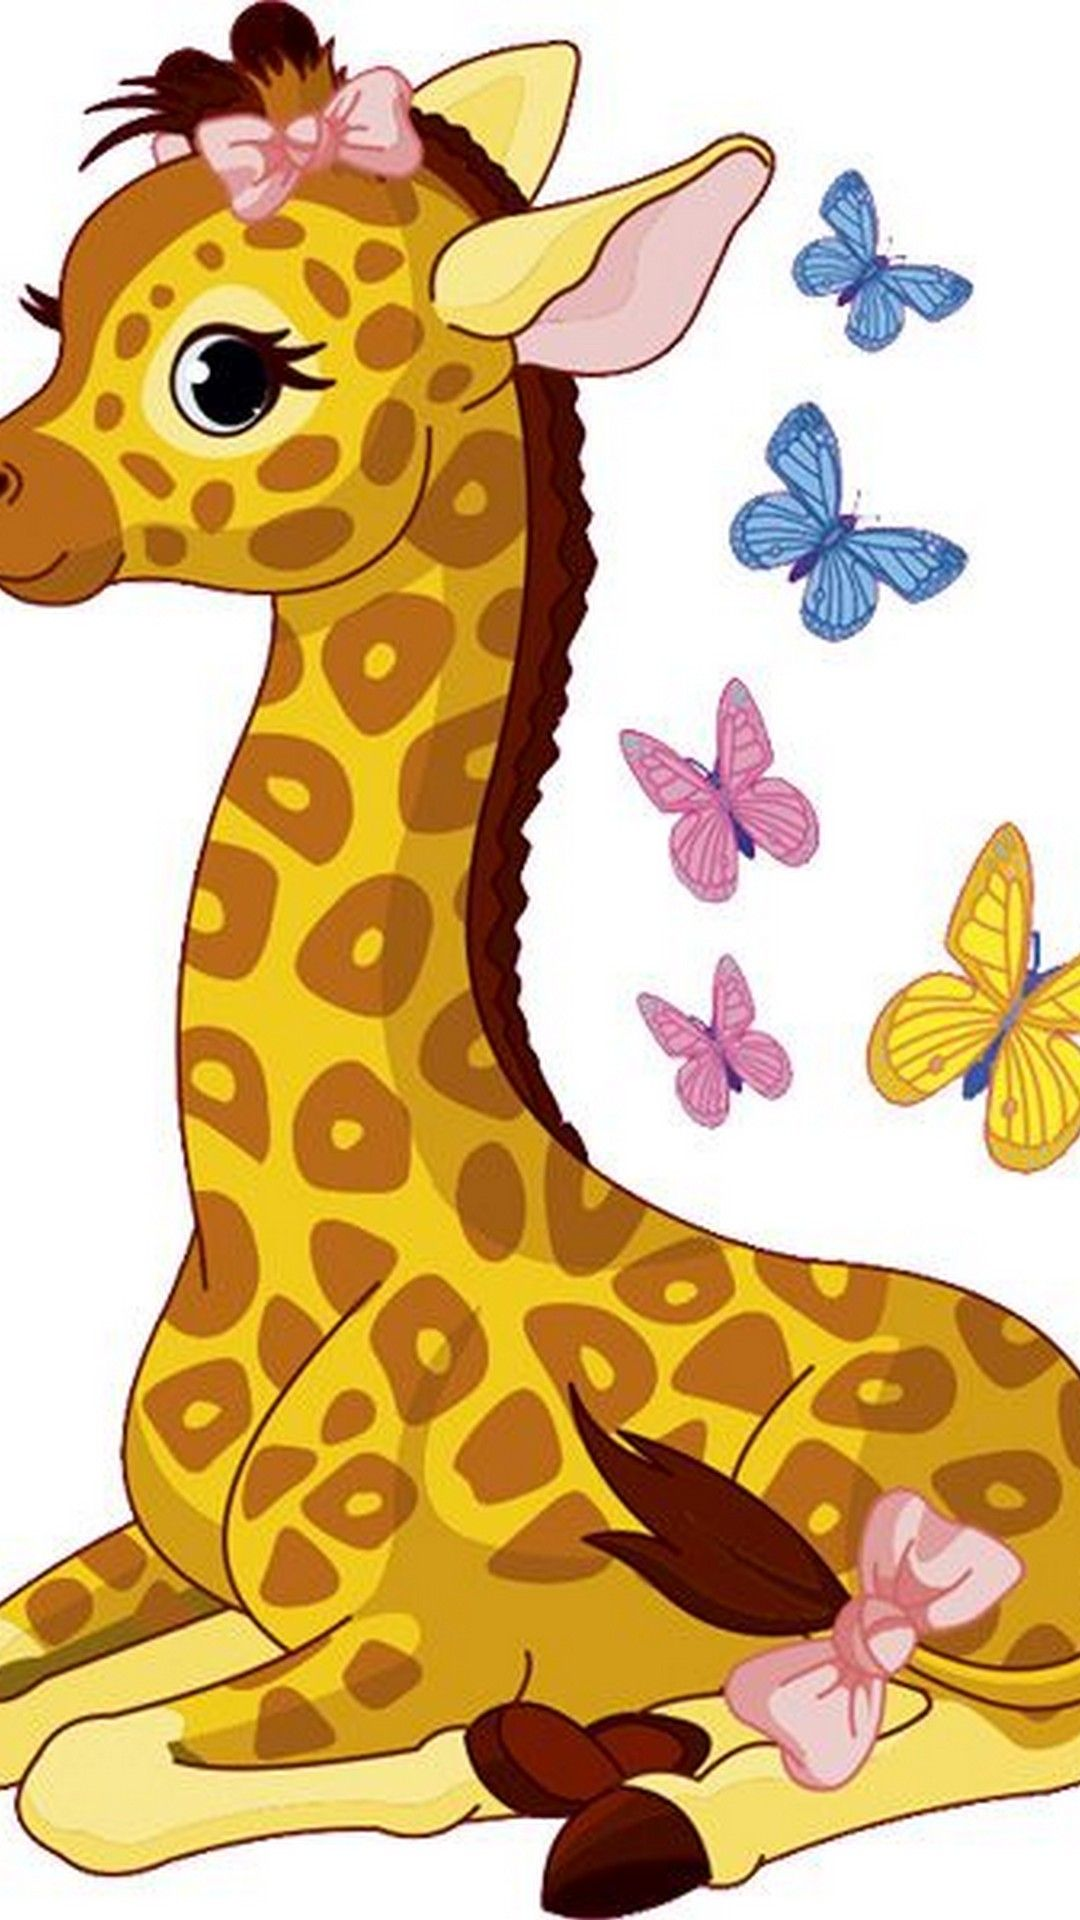 Cute Baby Giraffe Wallpaper Iphone Best Iphone Wallpaper Giraffe Drawing Cartoon Giraffe Cute Giraffe